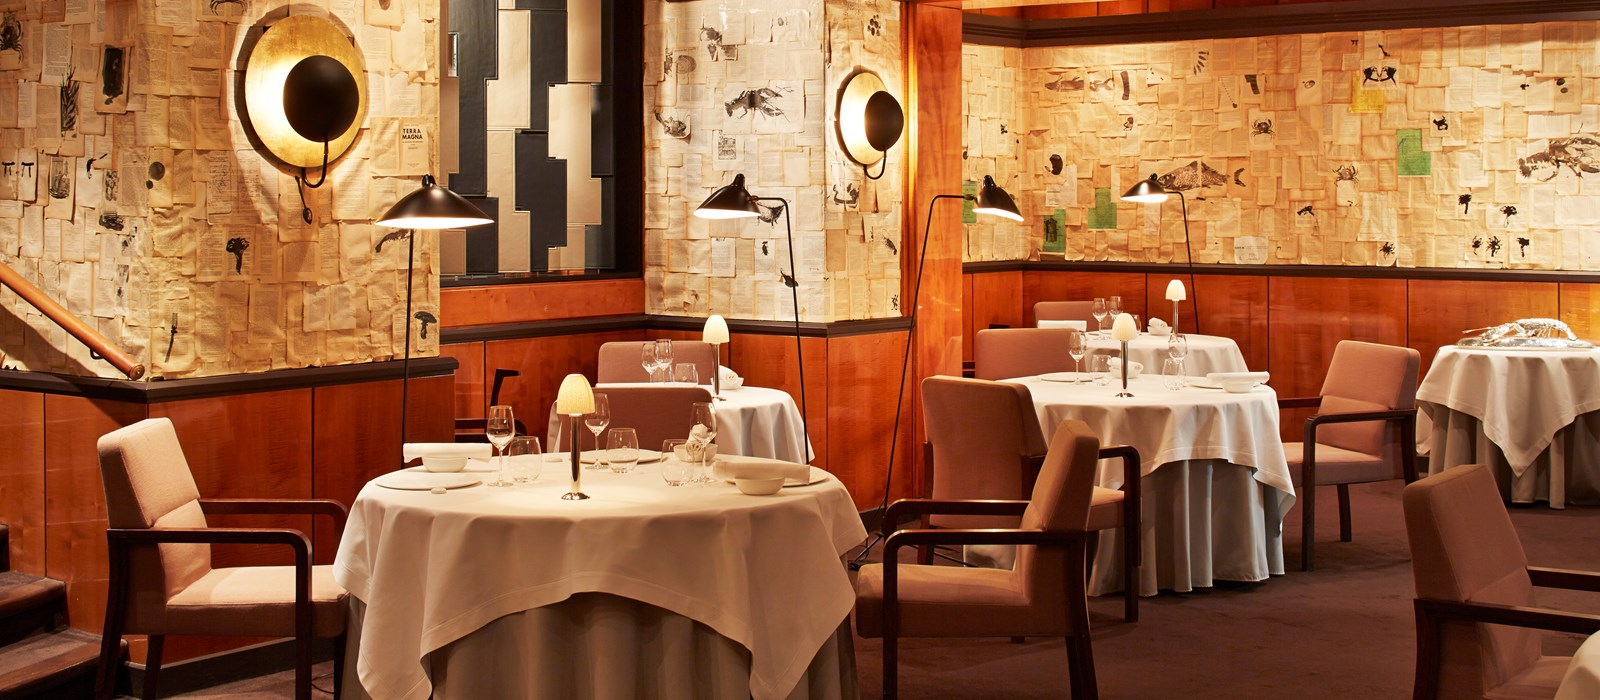 Restaurant Le Balzac Paris  Menu